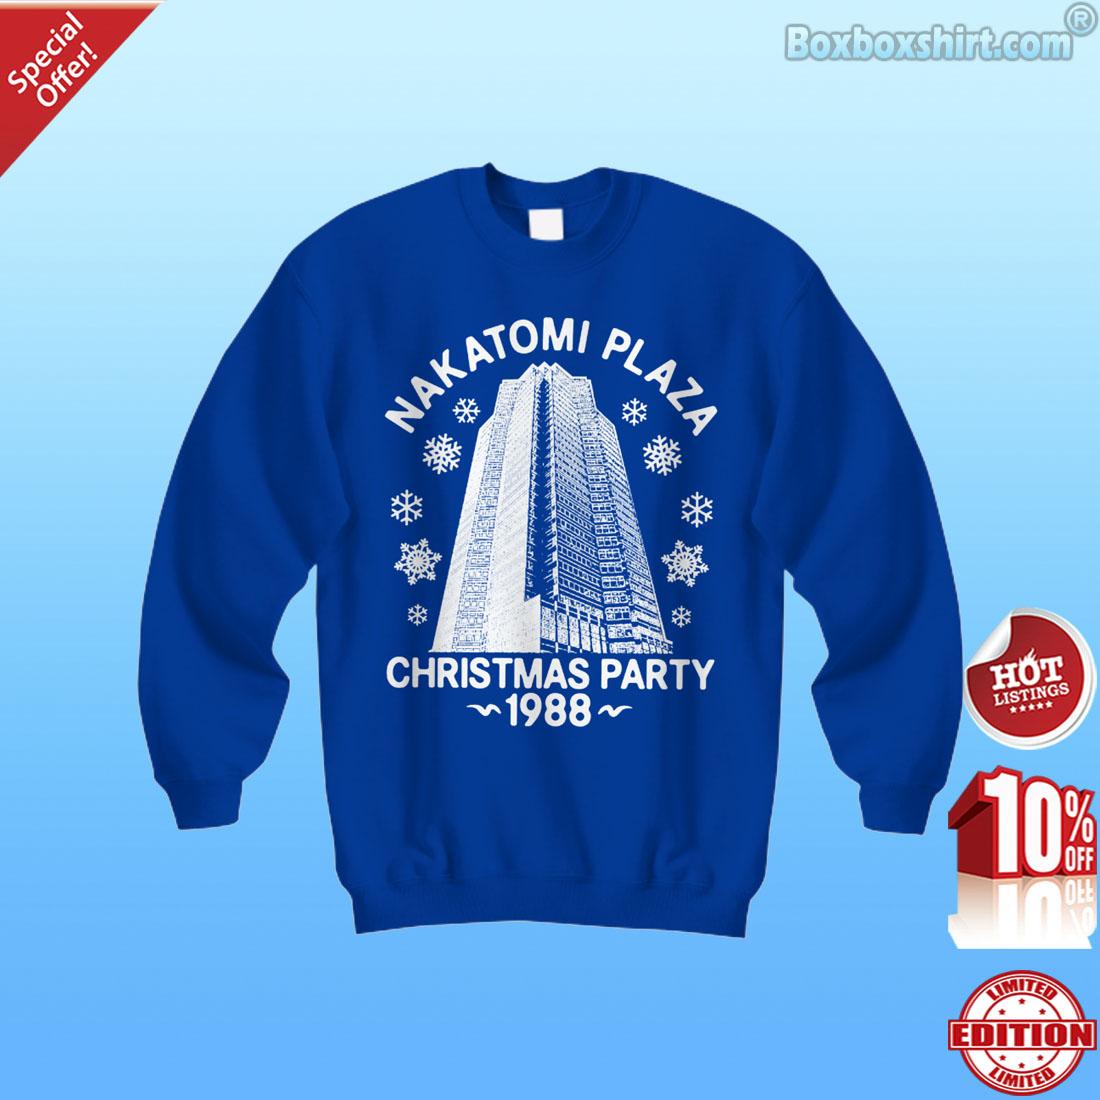 Nakatomi plaza Christmas Party 1988 shirt, youth tee